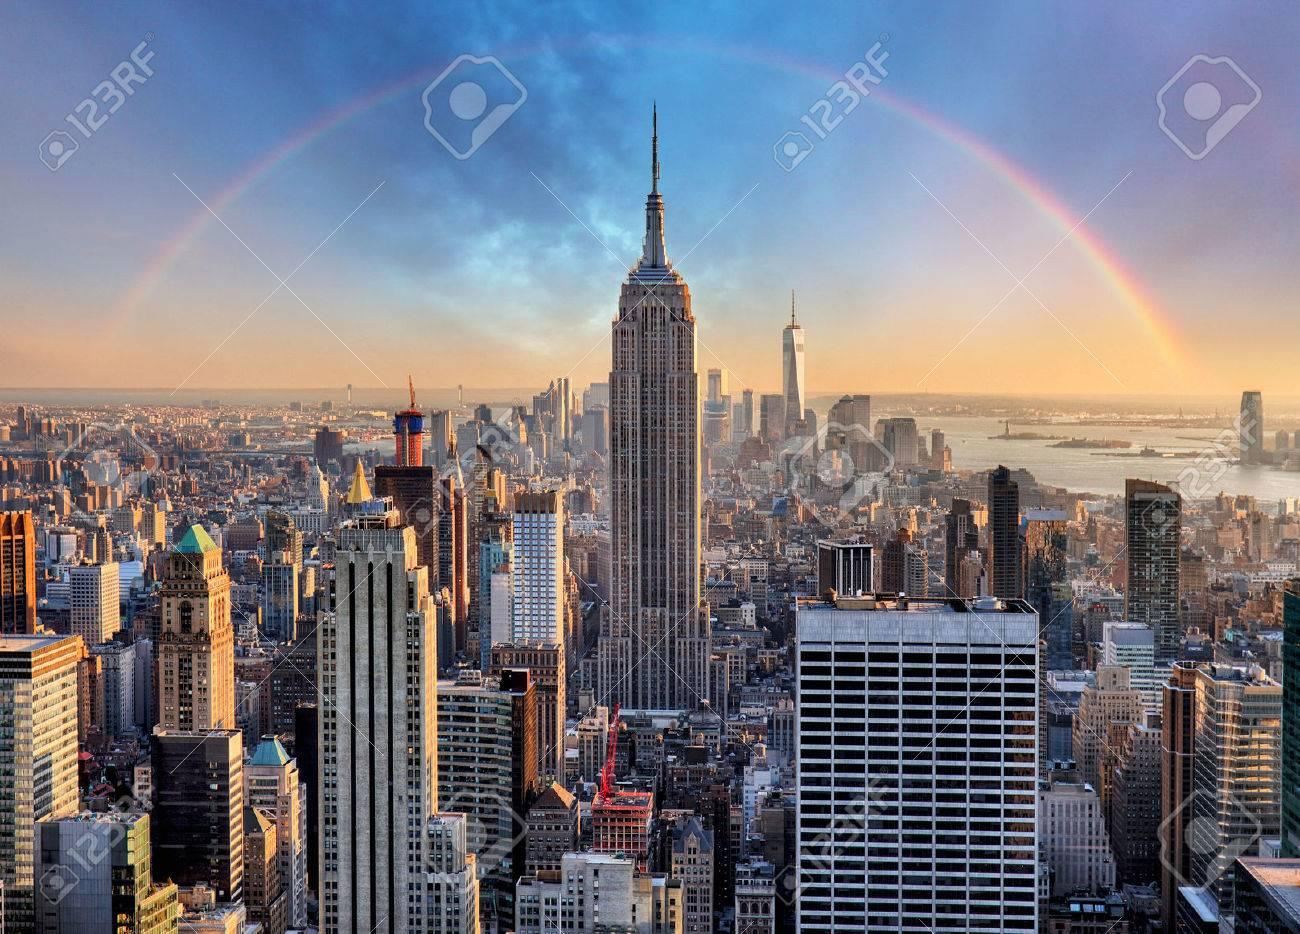 New York City skyline with urban skyscrapers and rainbow. - 57029801